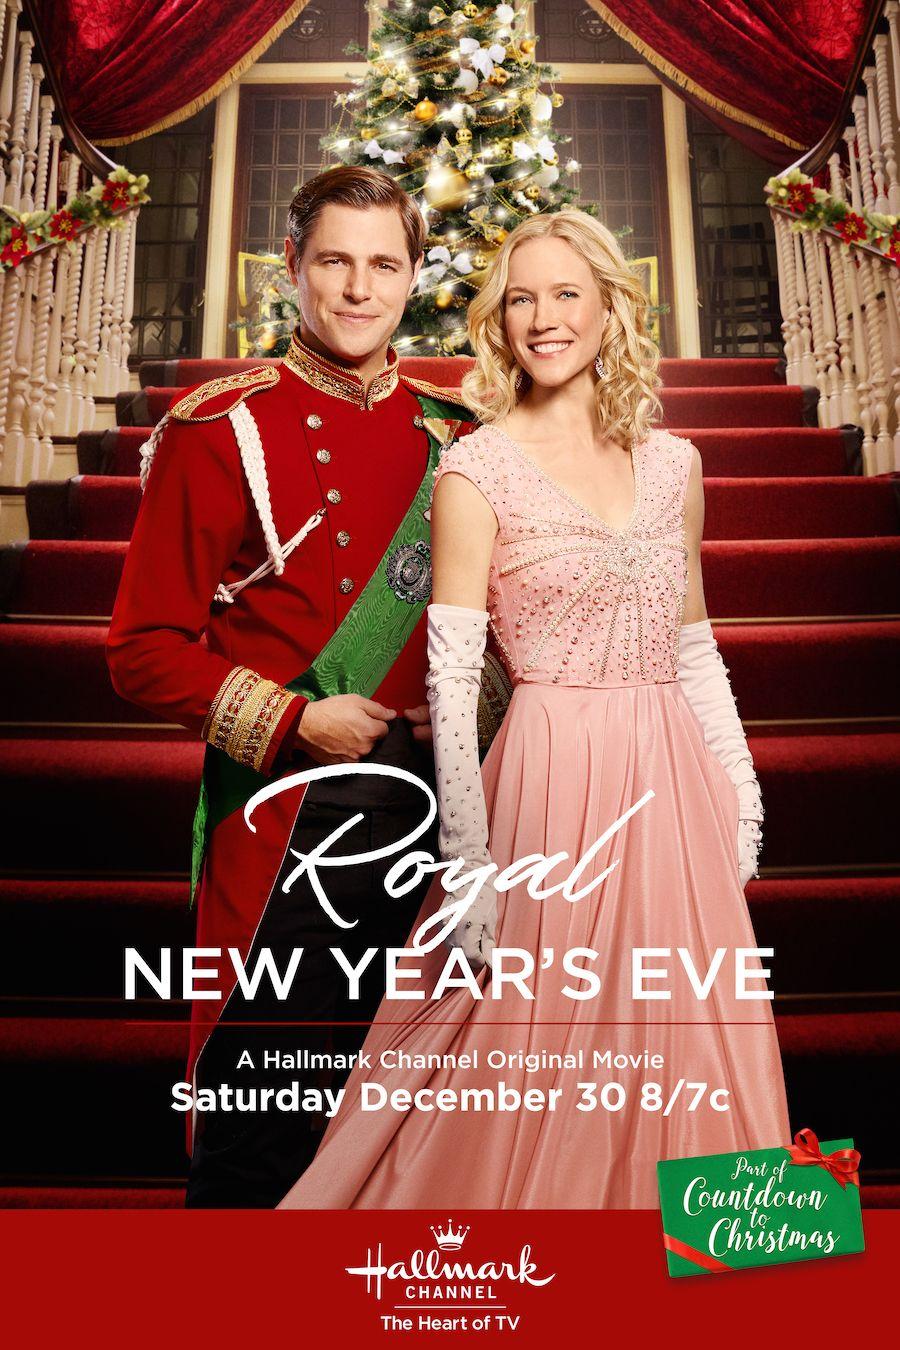 Royal New Year's Eve Sam Page and Jessy Schram celebrate